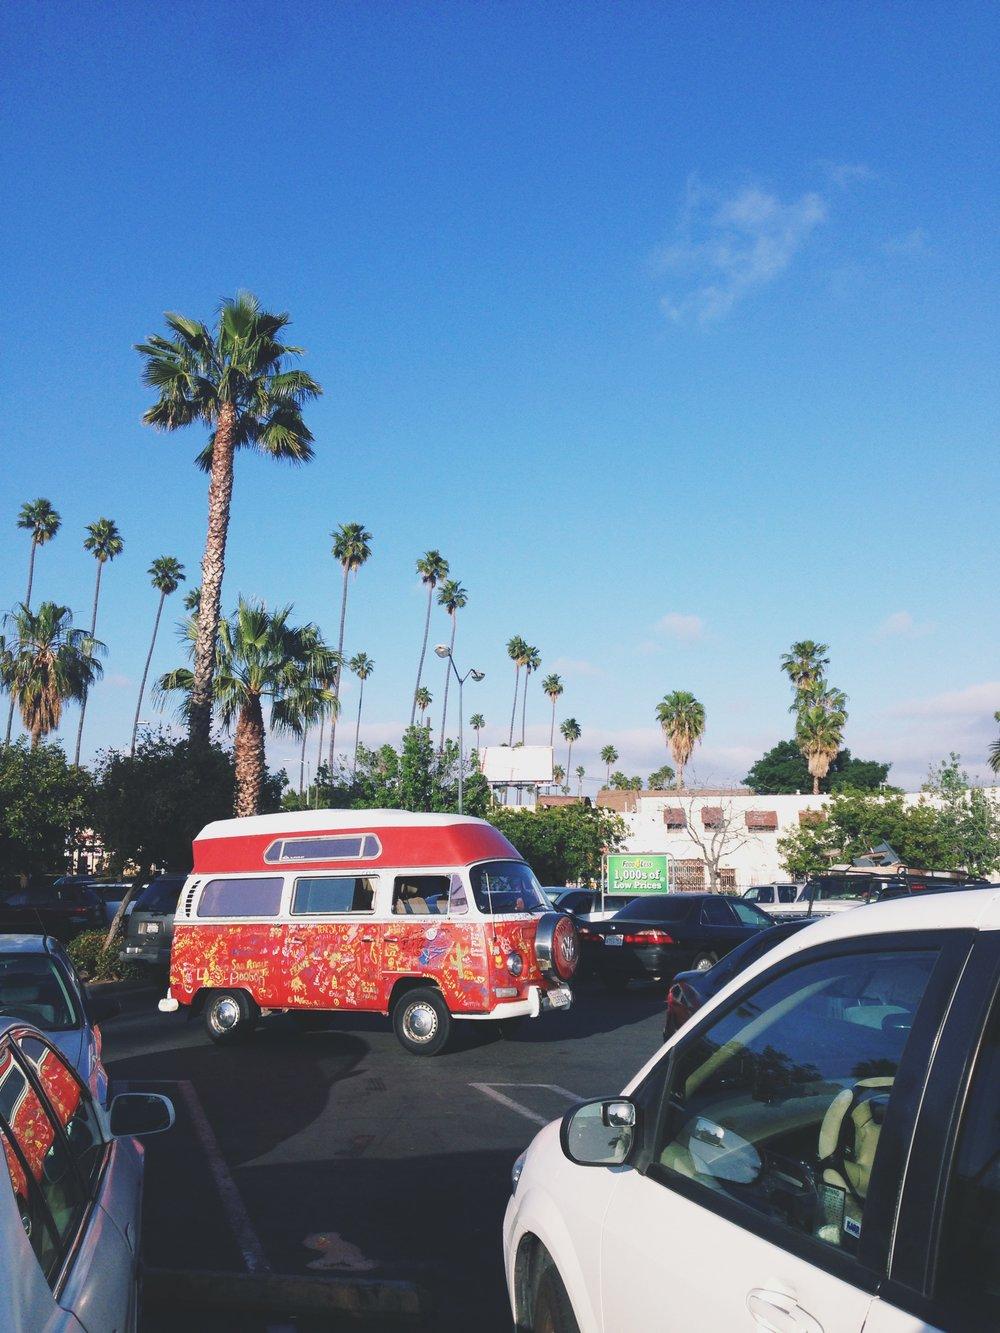 Los Angeles, 2016.